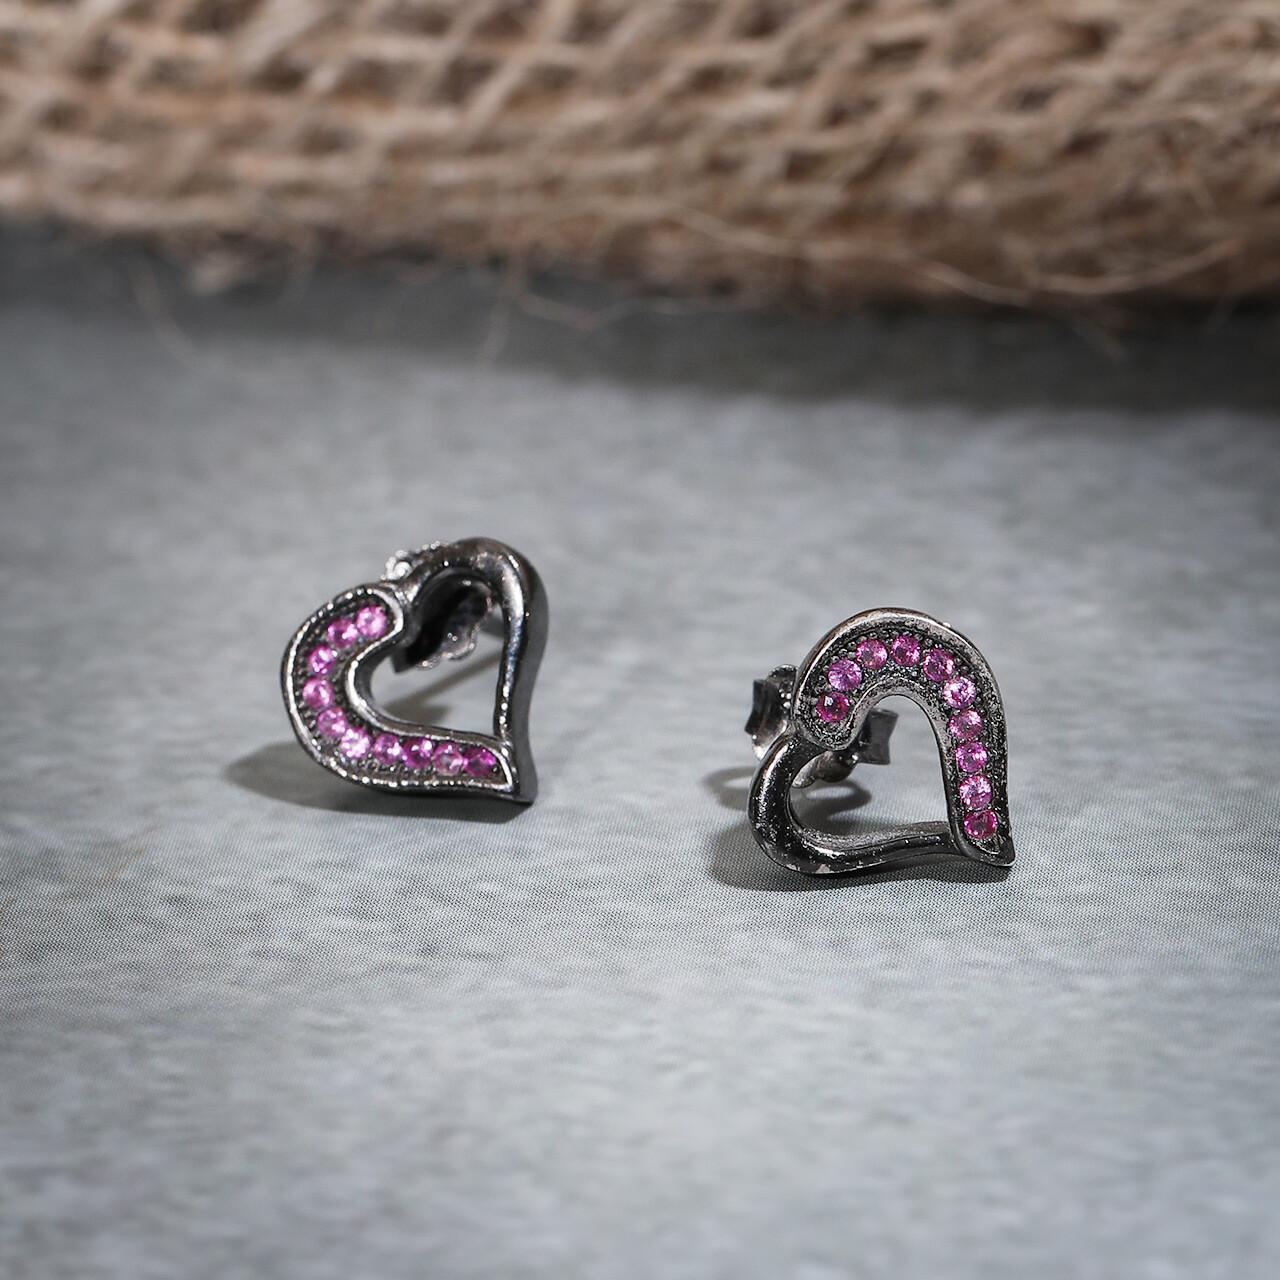 IndusDiva Coloured Micro Stone Studs Heart Earring